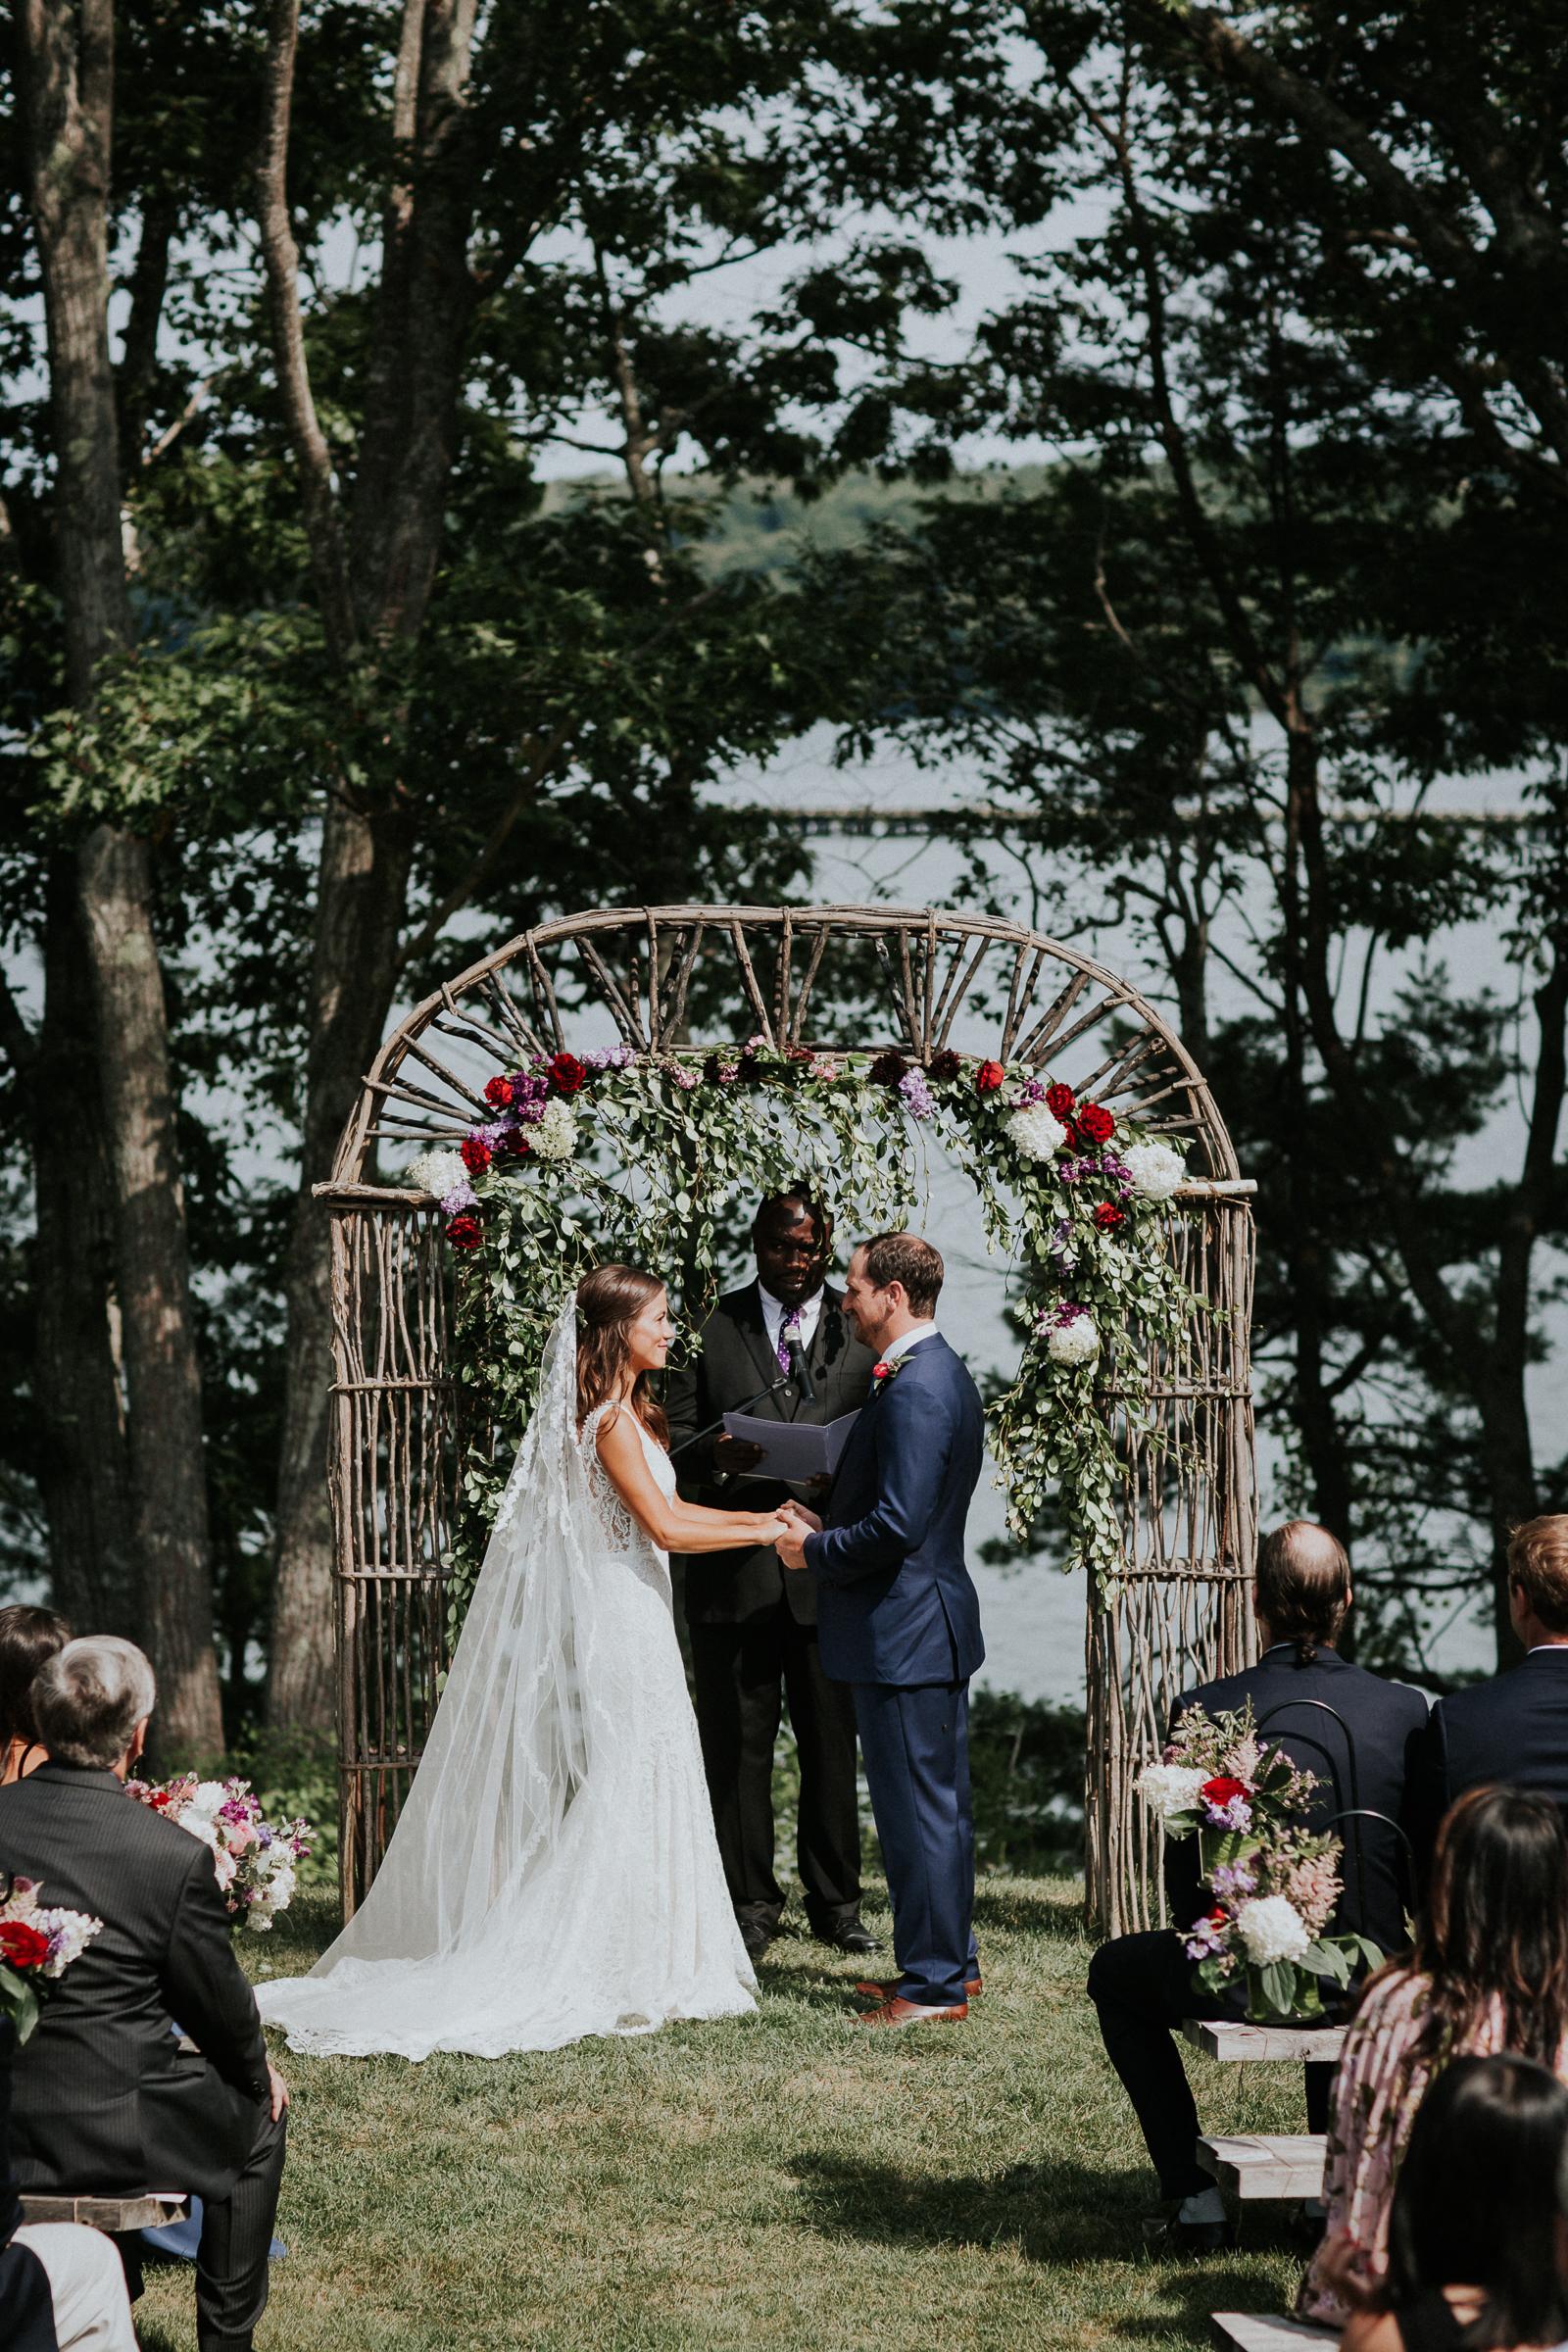 Marianmade-Farm-Wiscasset-Maine-Fine-Art-Documentary-Wedding-Photographer-Elvira-Kalviste-Photography-79.jpg